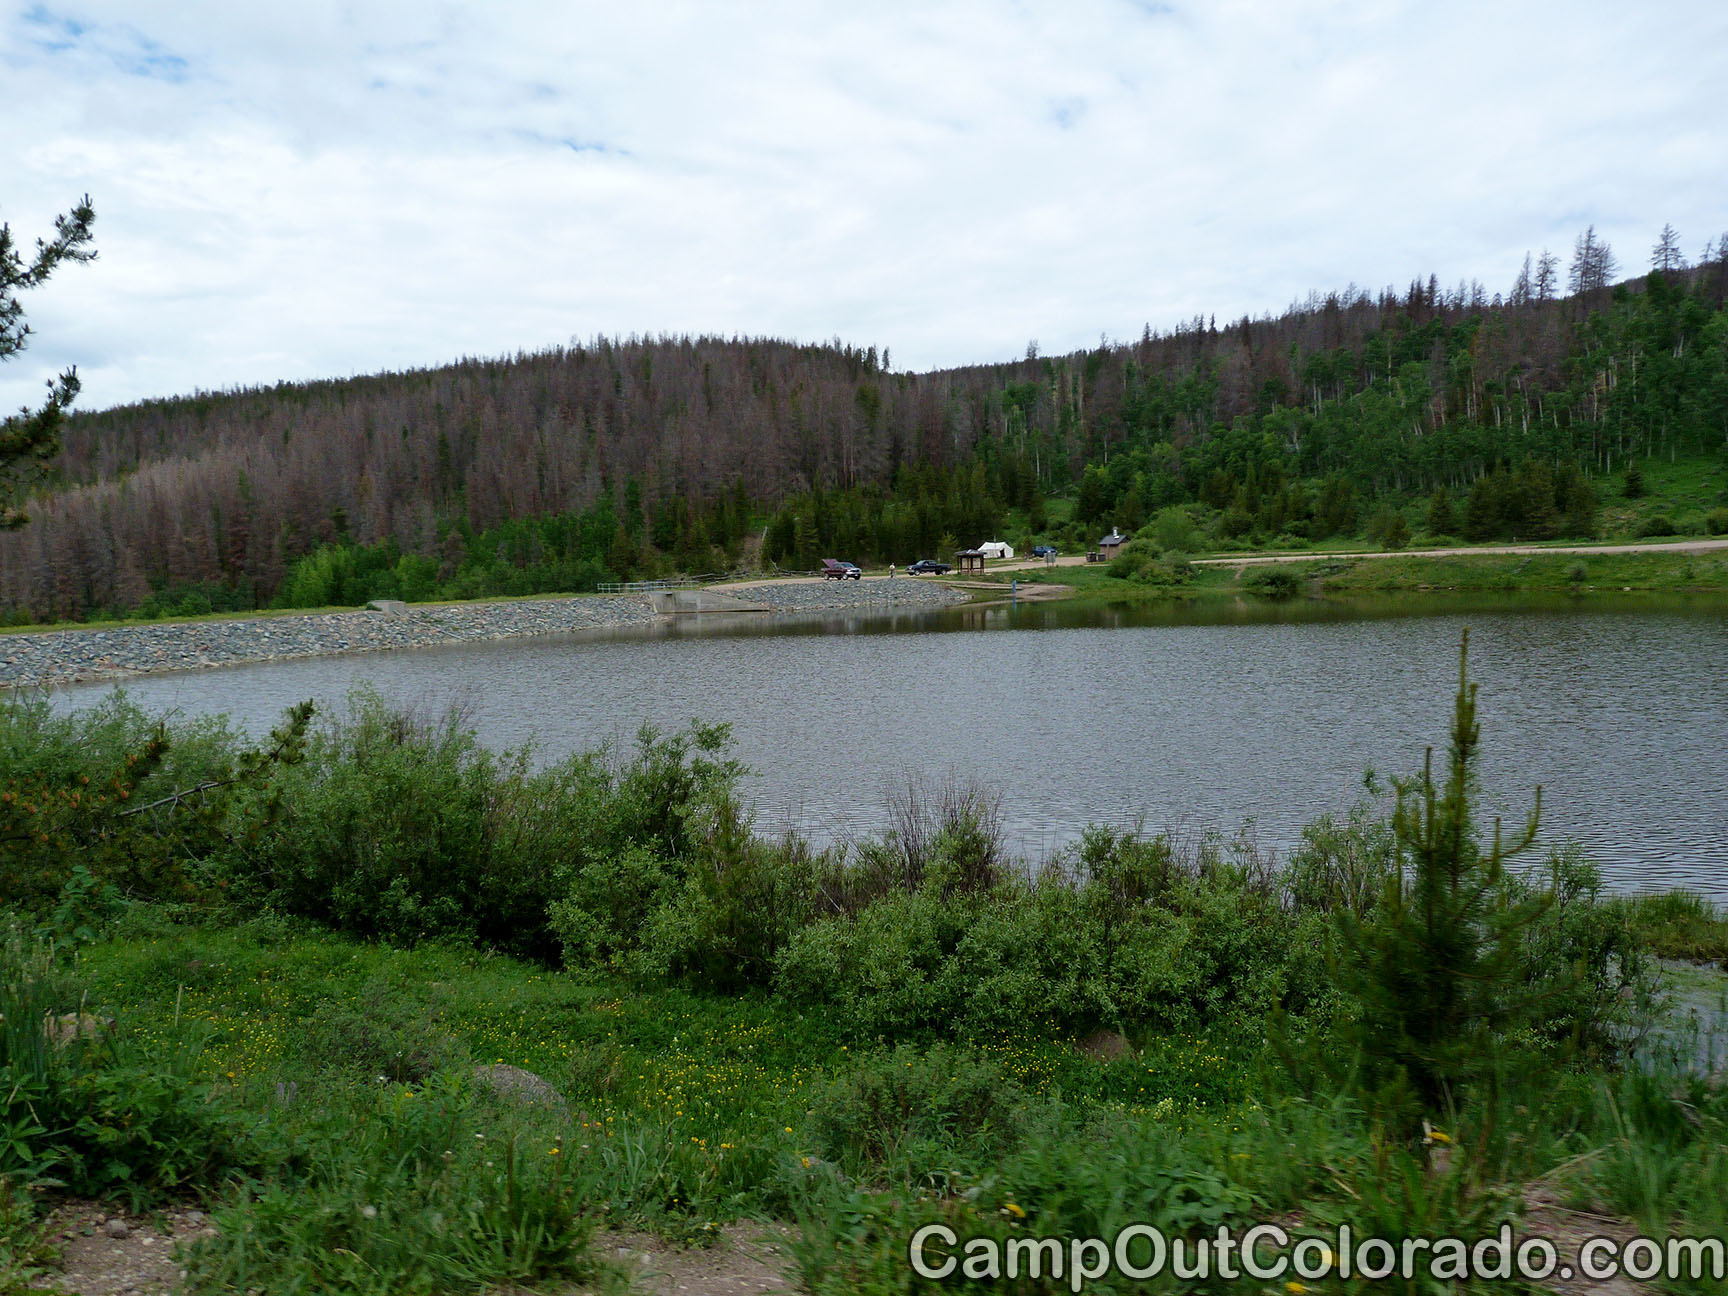 Campoutcolorado-north-michigan-reservoir-campground-dam-view